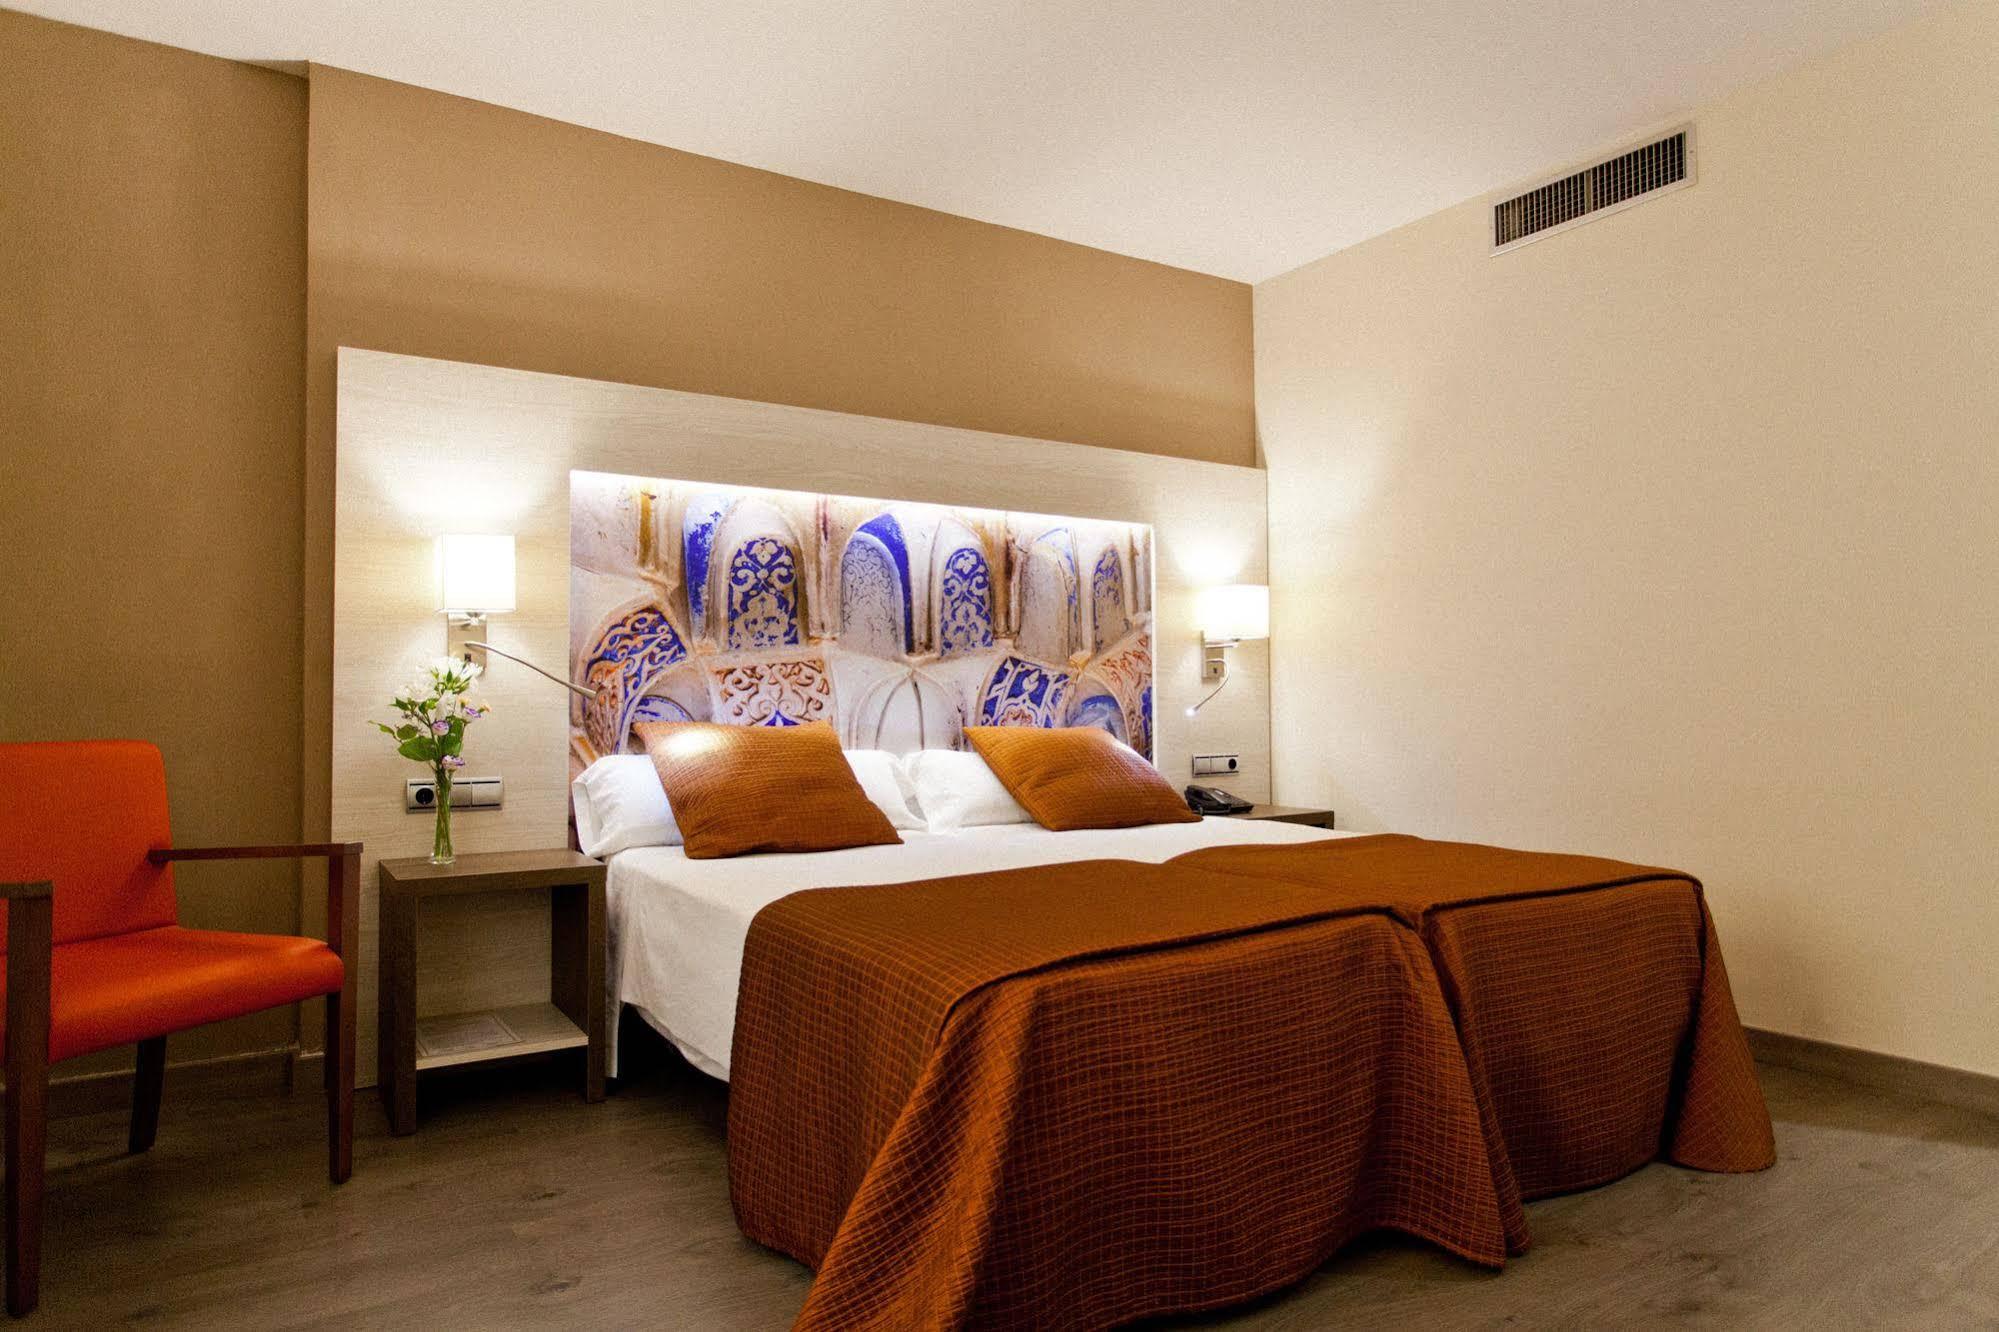 Hotel Corona de Granada - Granada